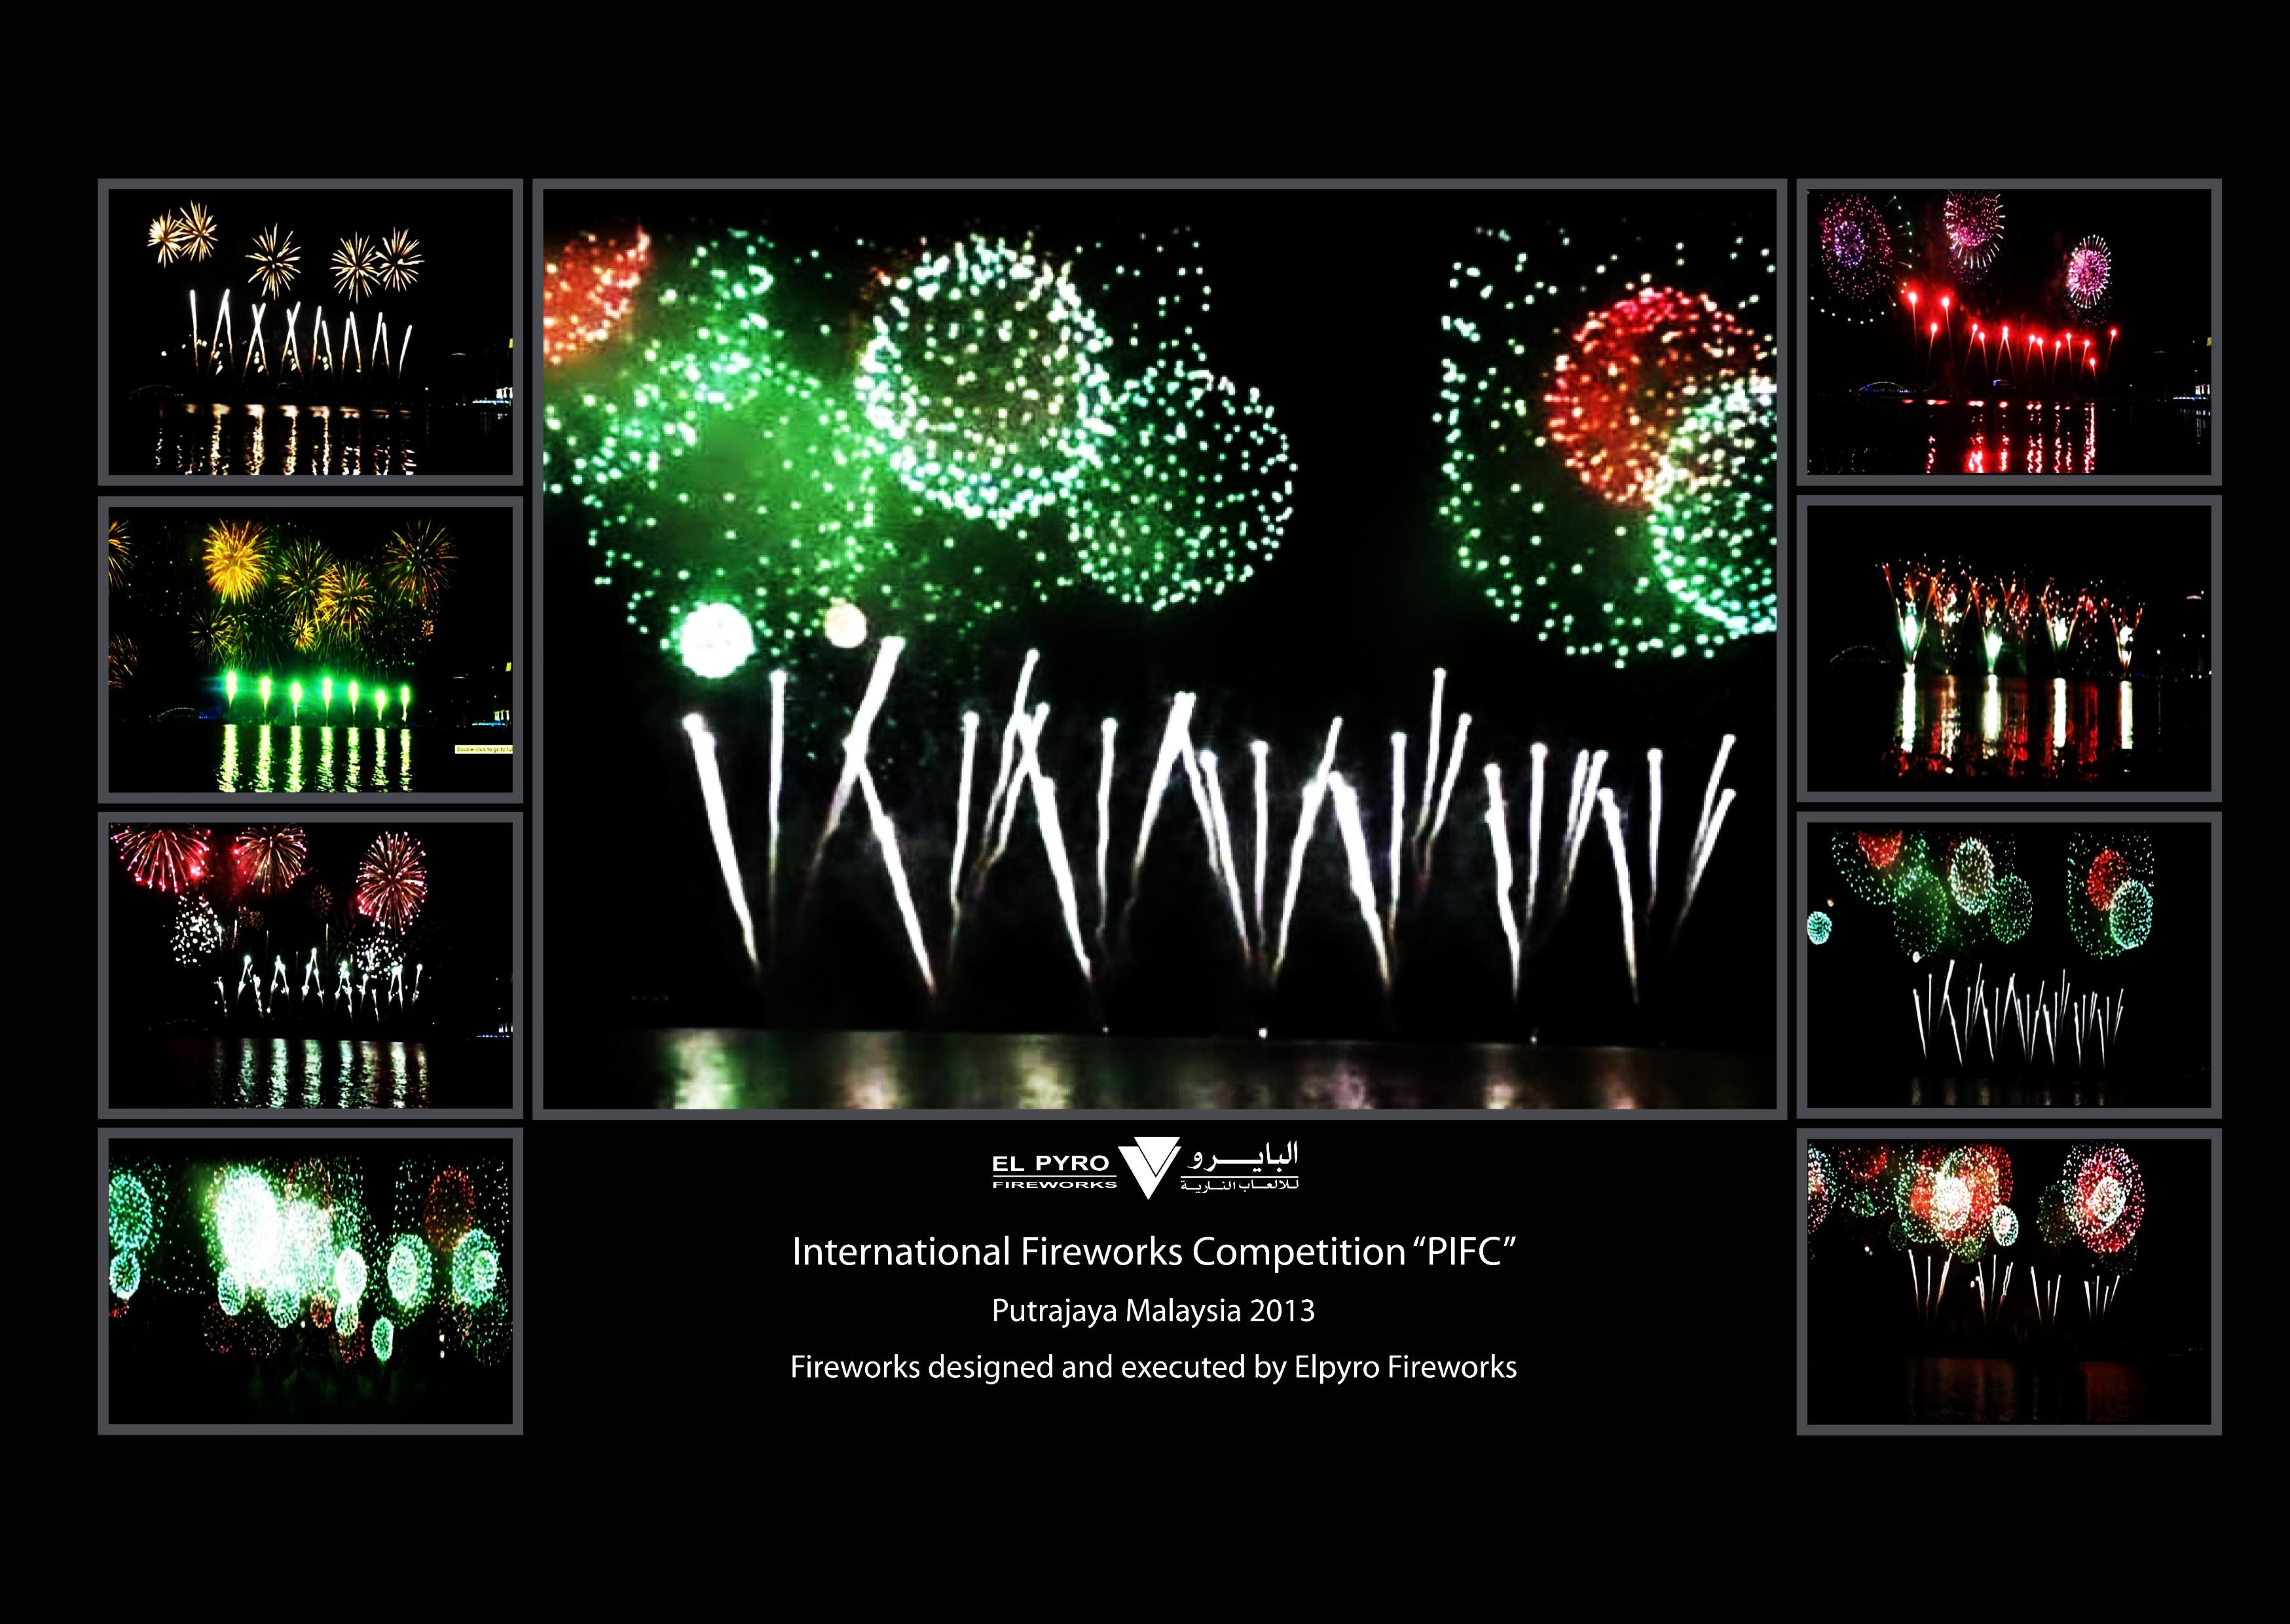 Putrajaya Intl Fireworks Competition